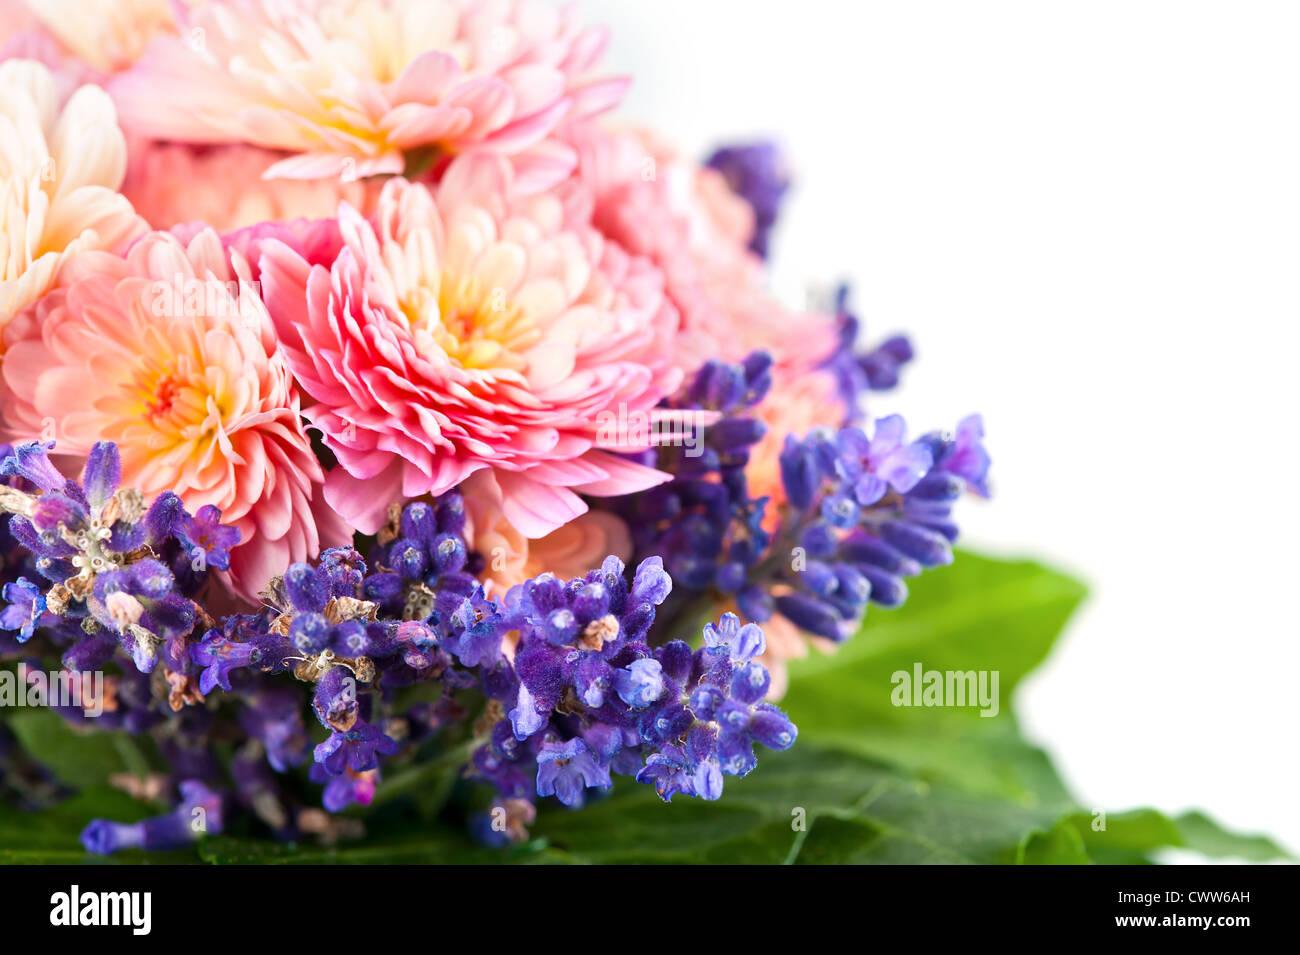 chrysanthemum bouquet stockfotos chrysanthemum bouquet bilder alamy. Black Bedroom Furniture Sets. Home Design Ideas